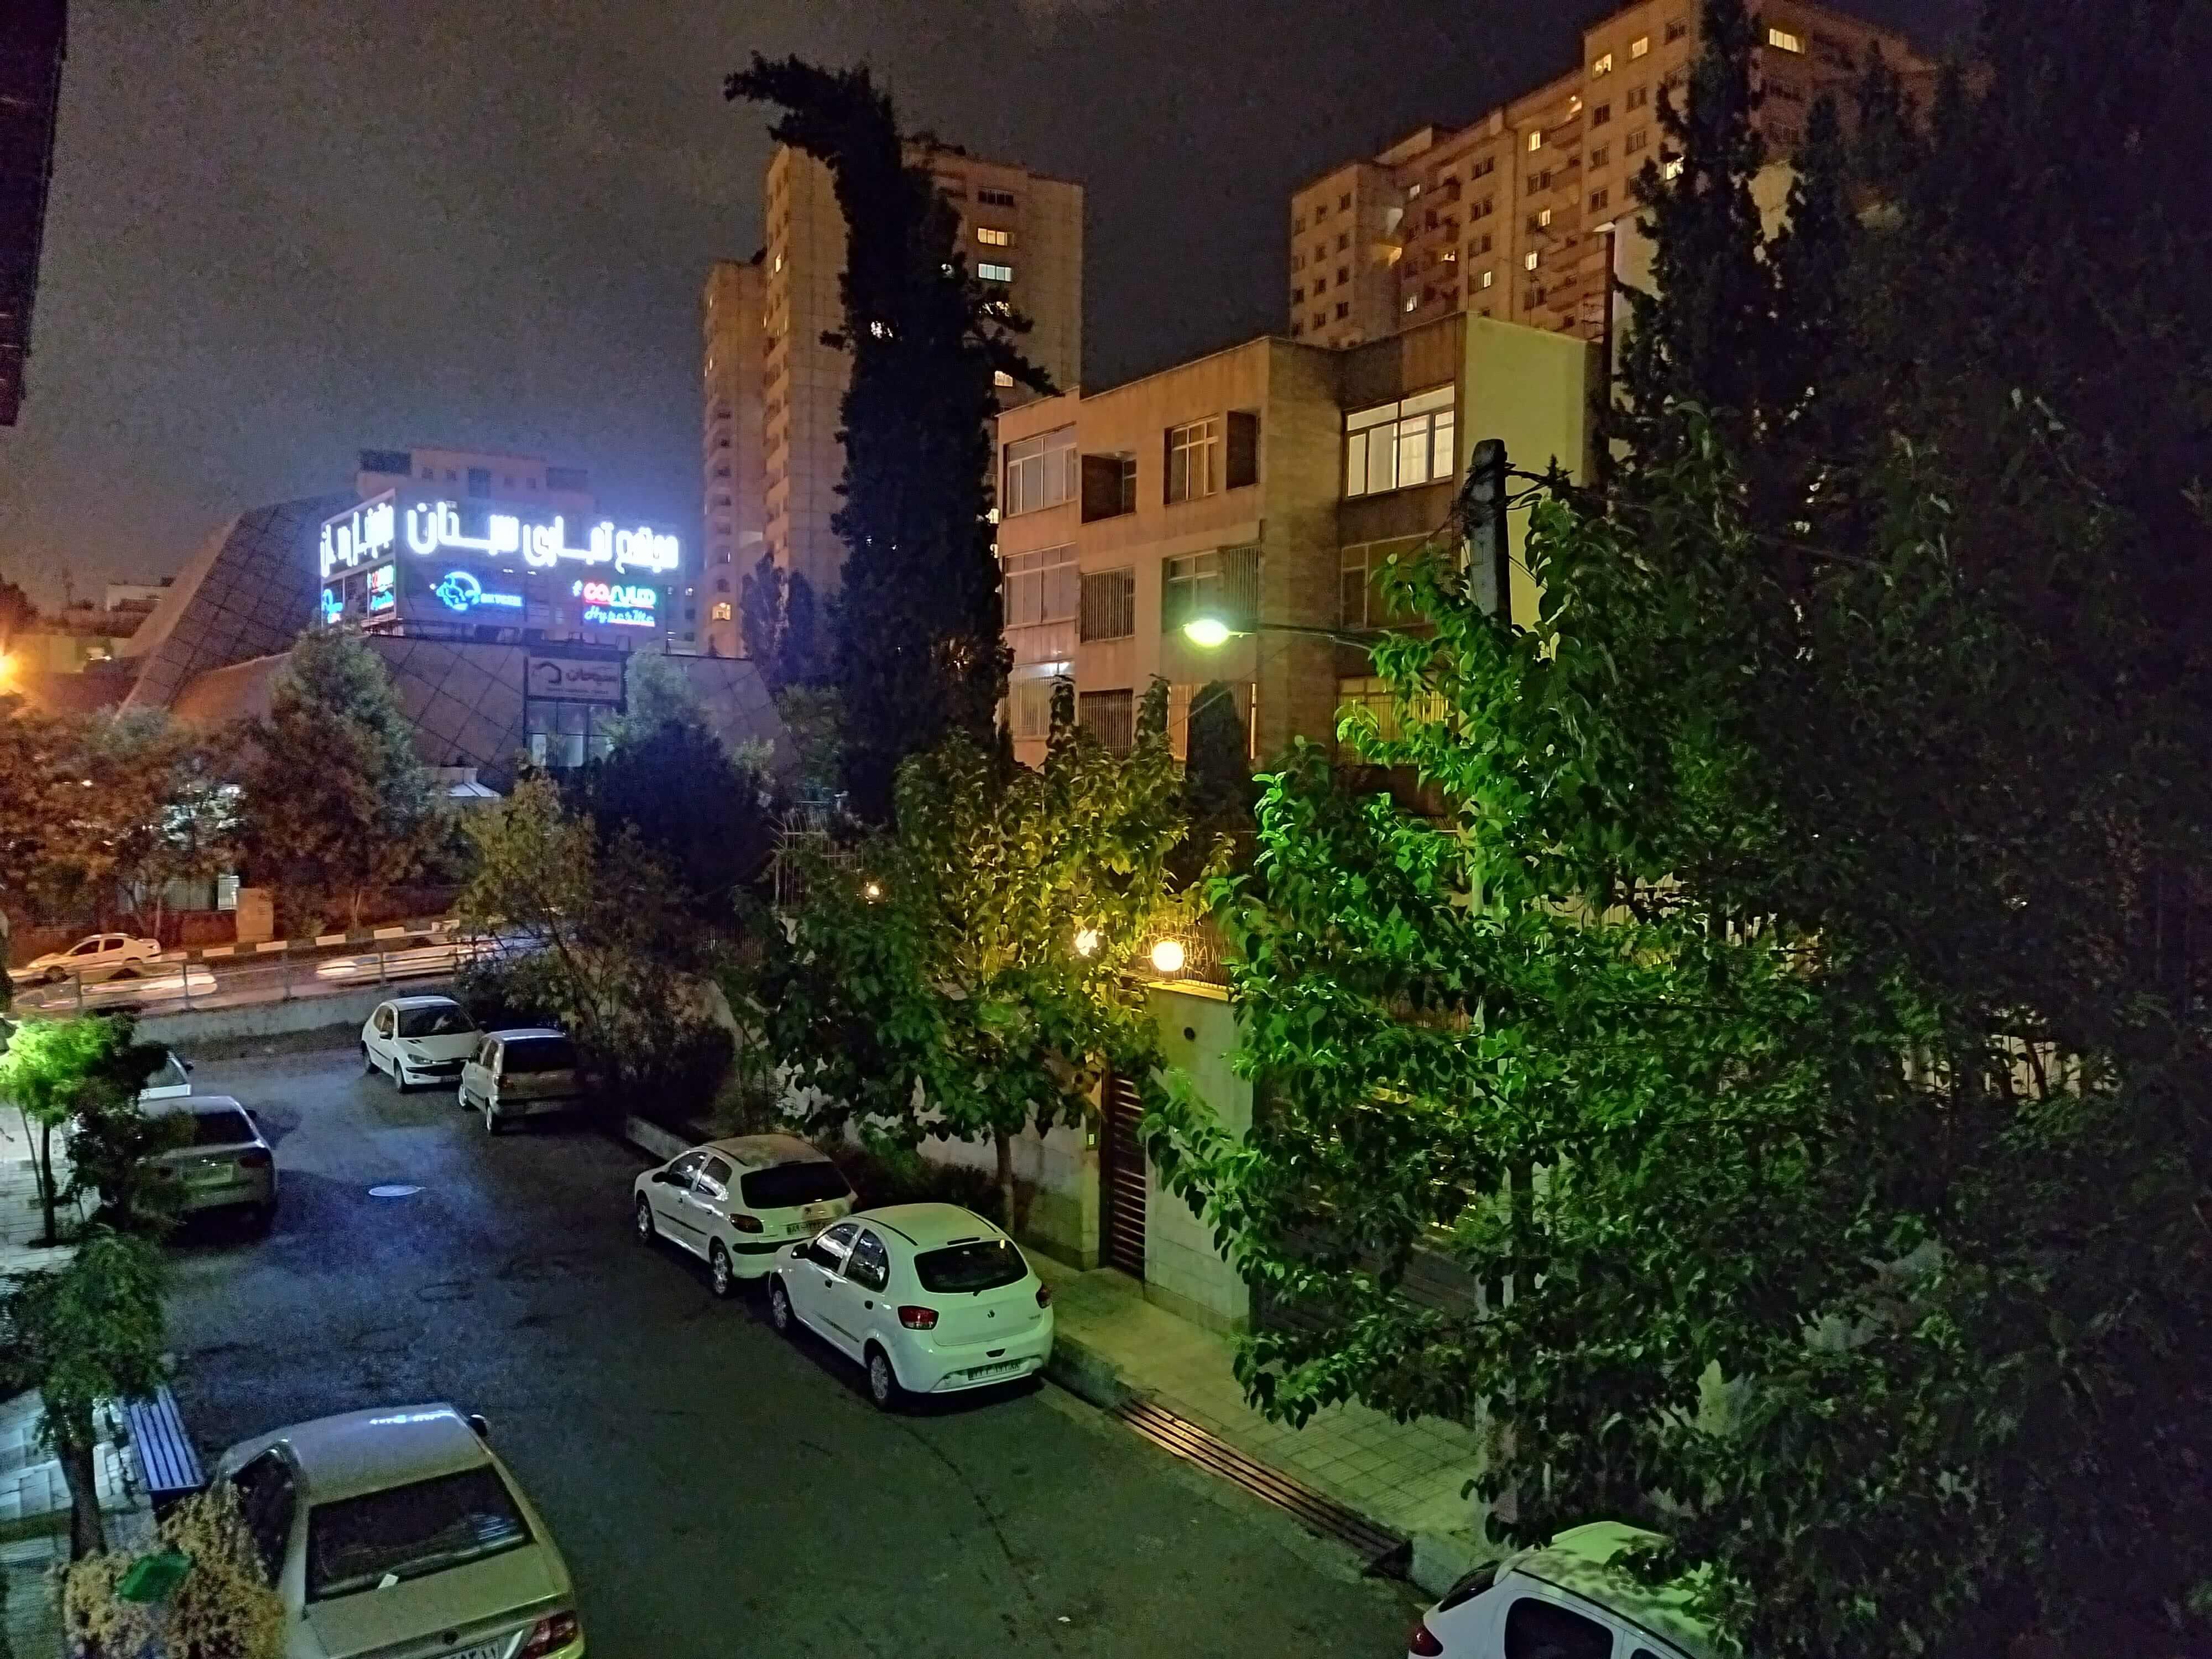 night mode photo by poco m3